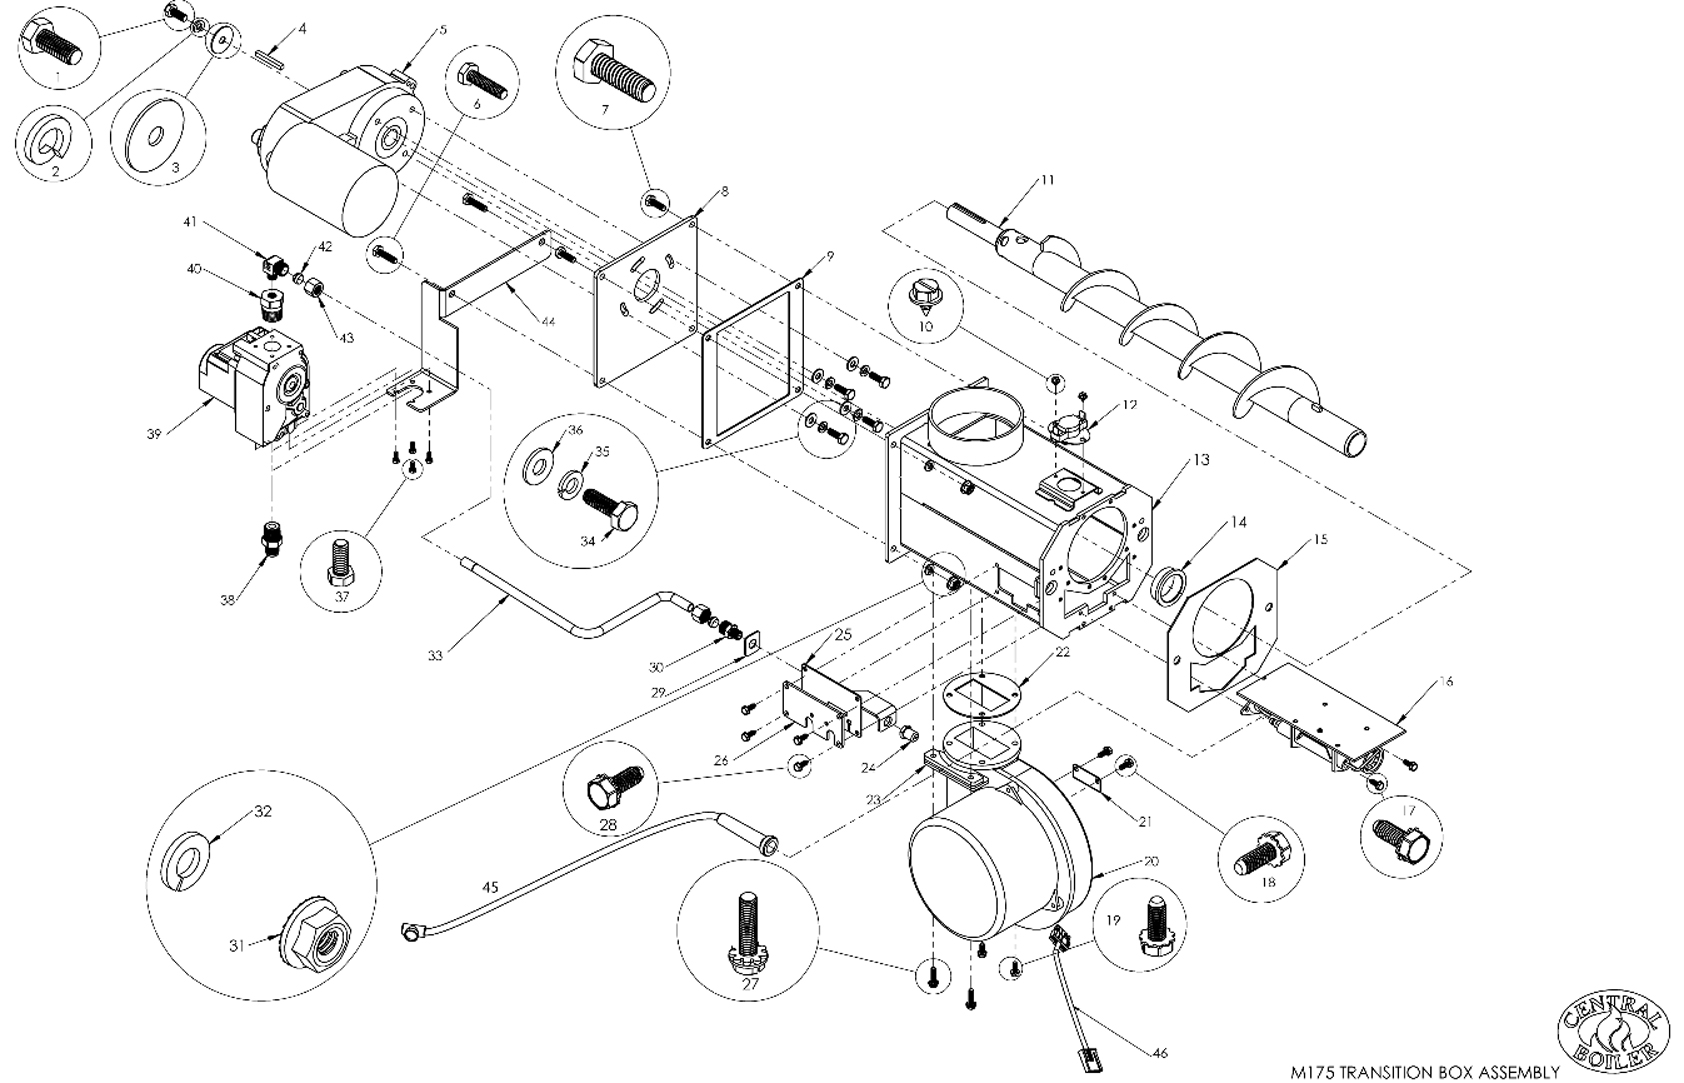 M175 Assembled Transition Box